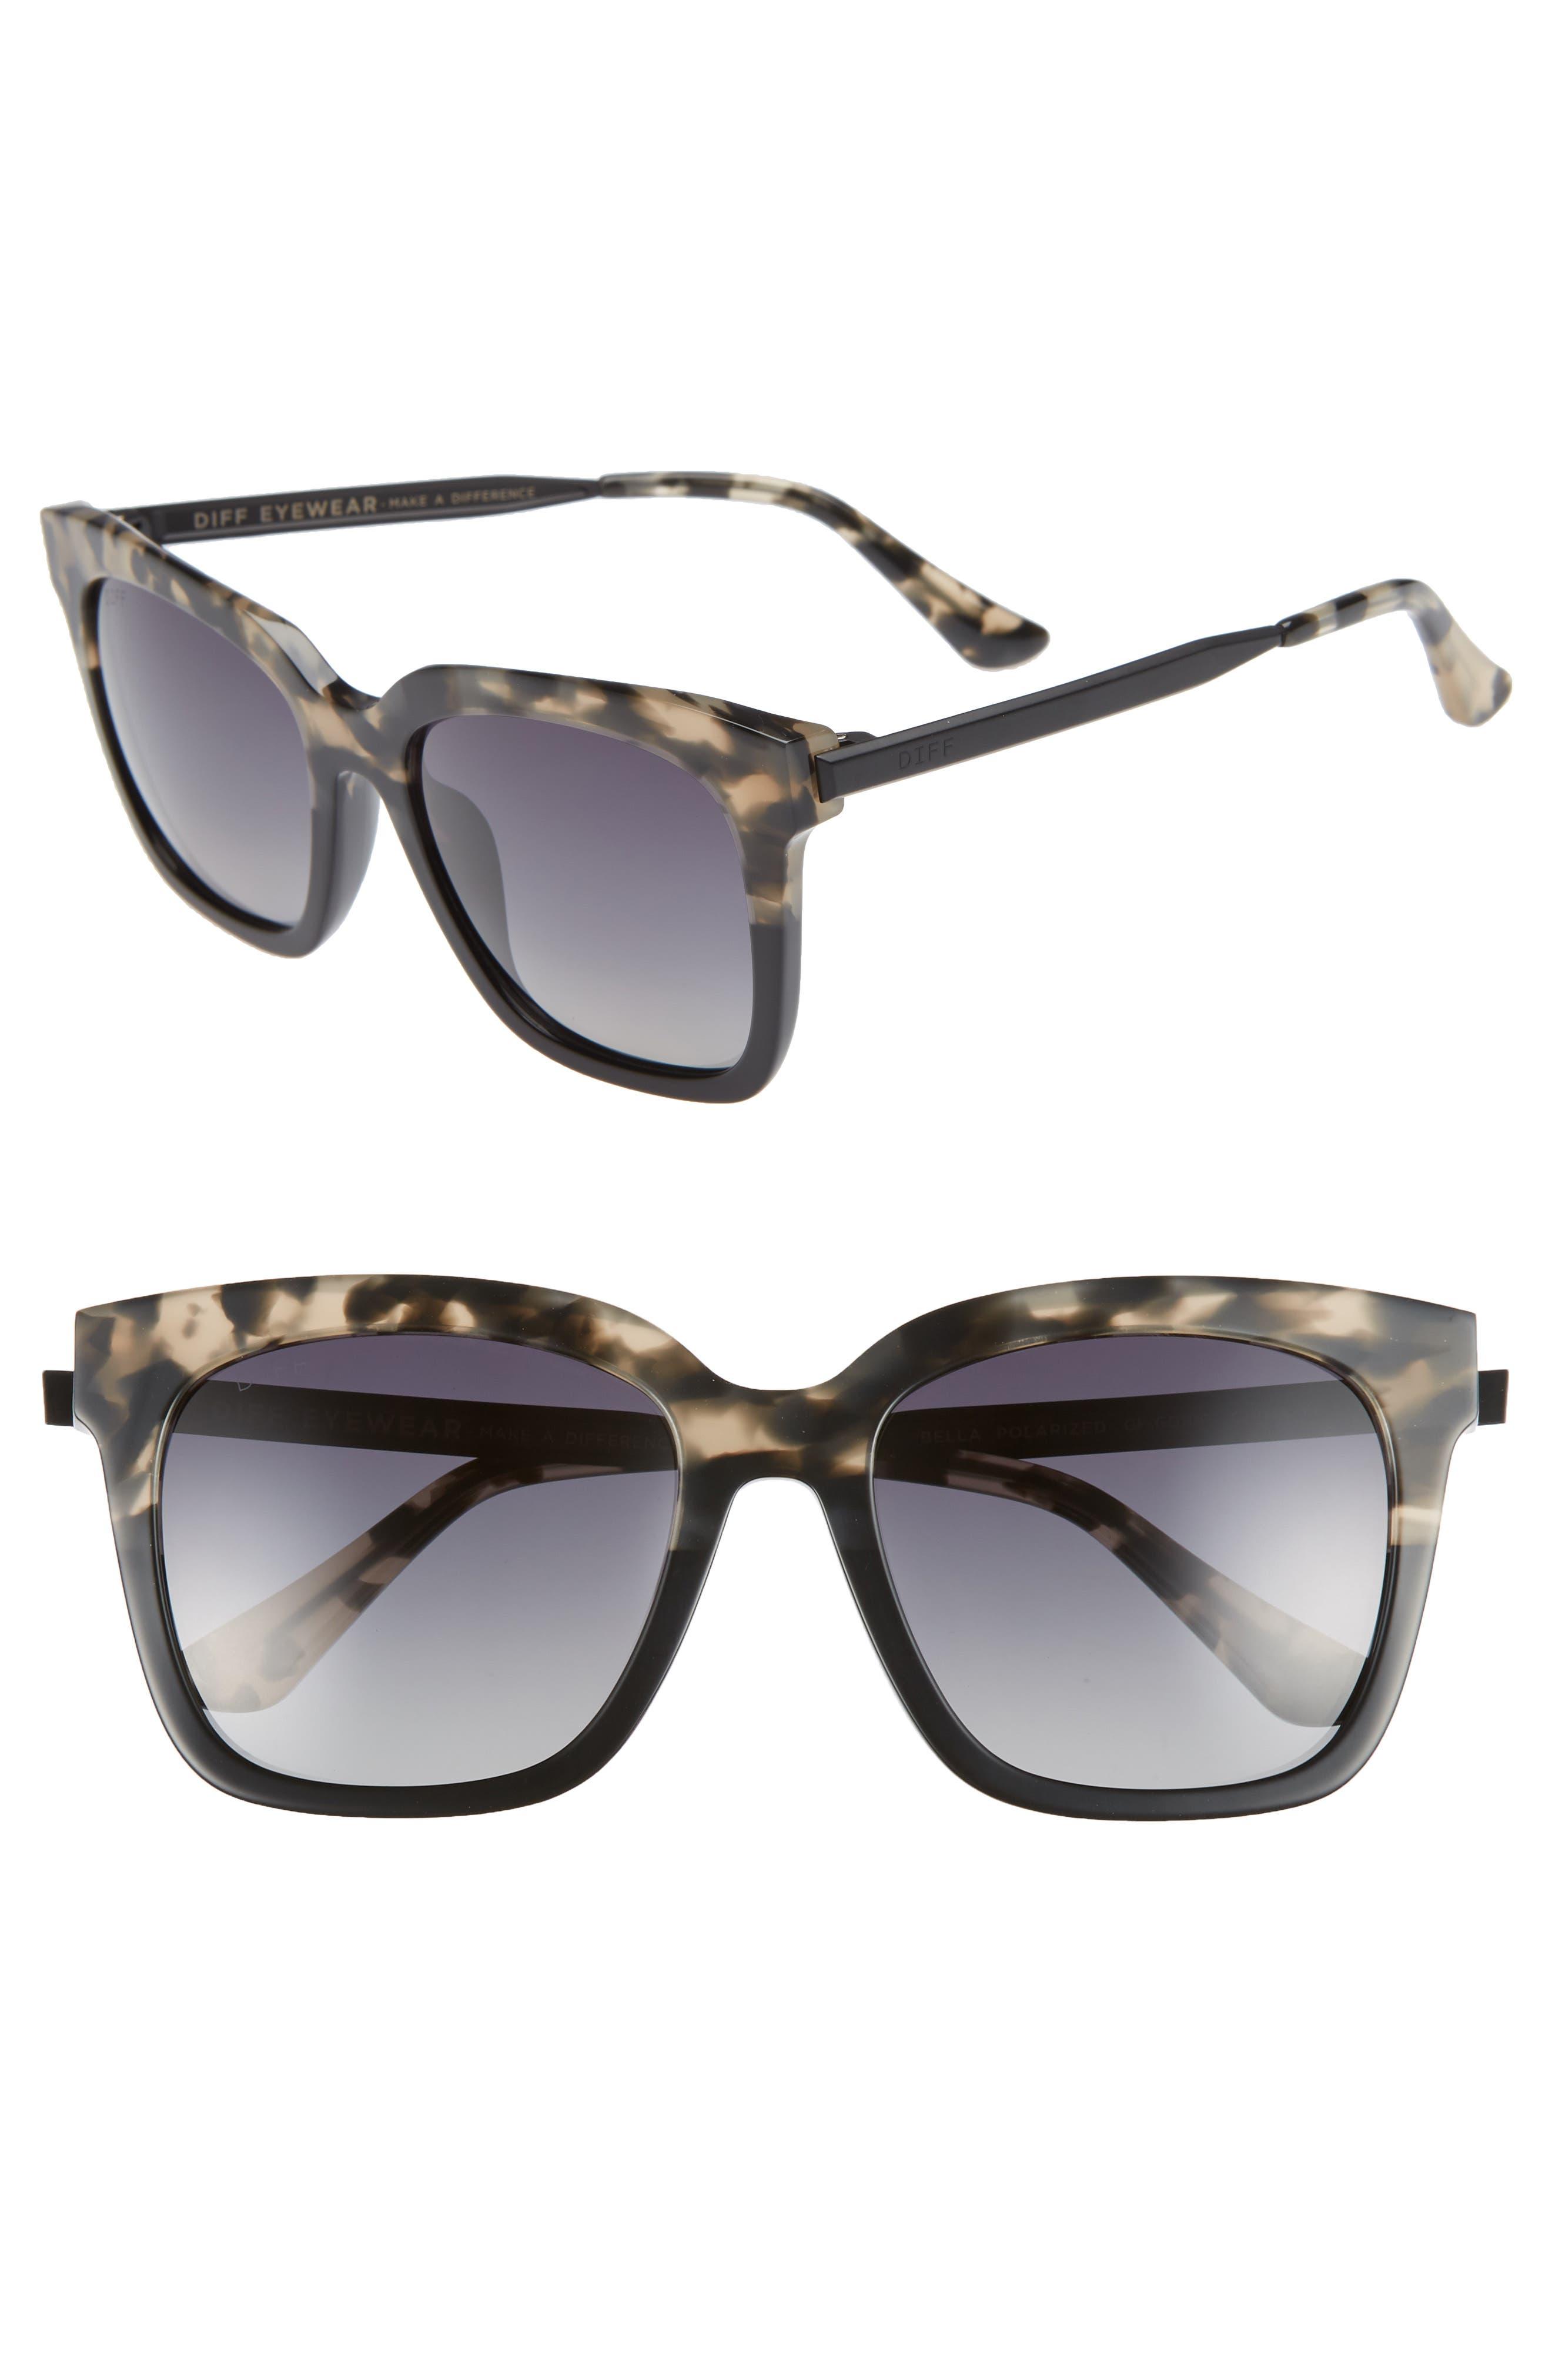 Bella 52mm Polarized Sunglasses,                             Main thumbnail 1, color,                             GREY FAGE/ GREY